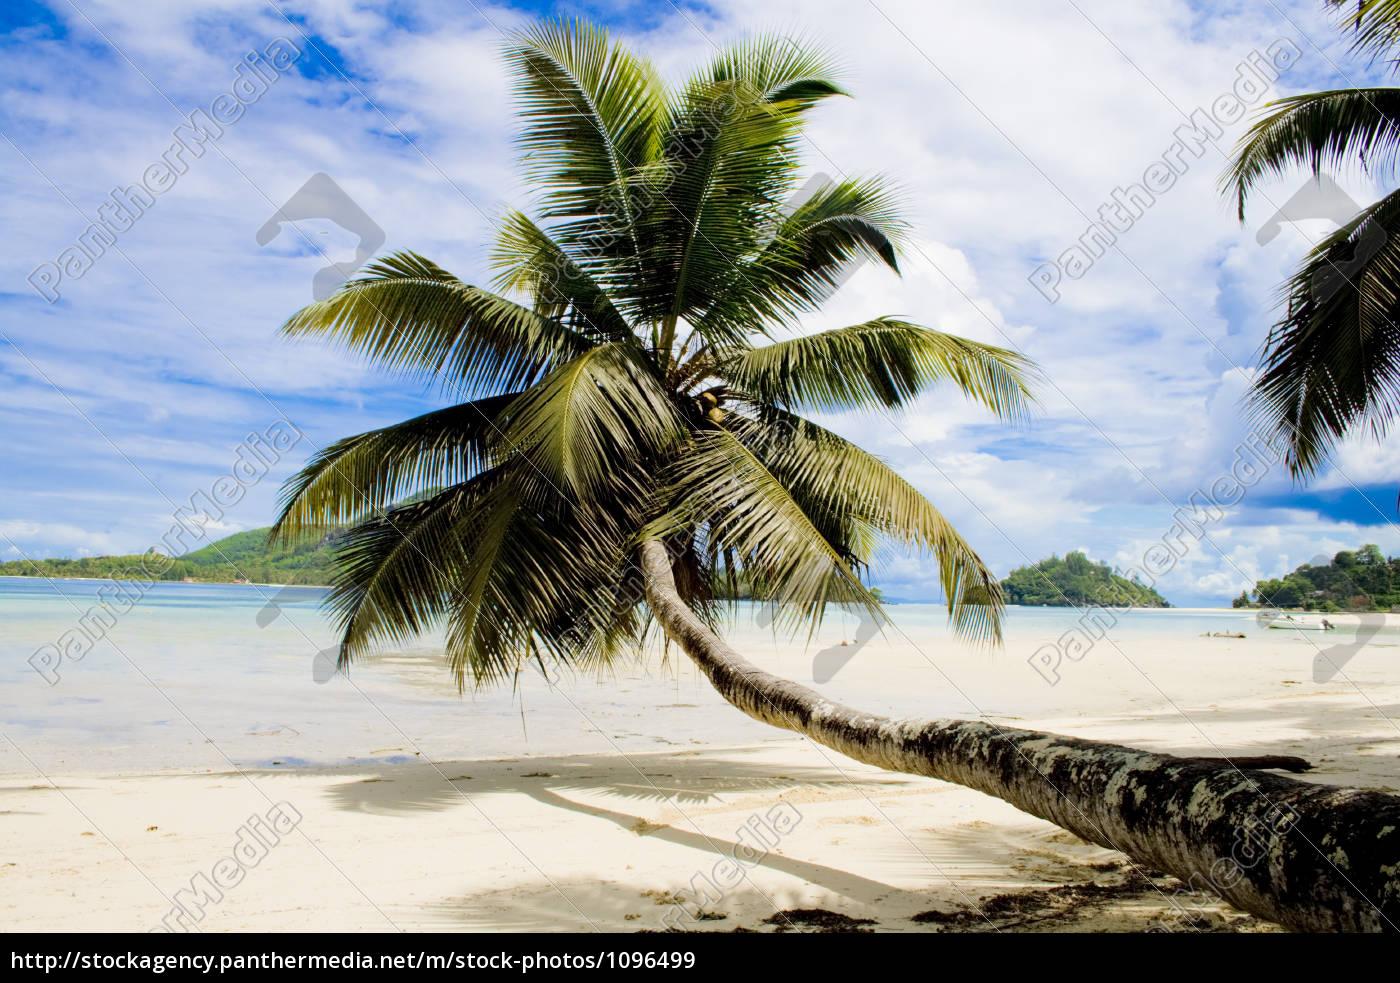 seychelles, -, palm, tree, at, beach - 1096499